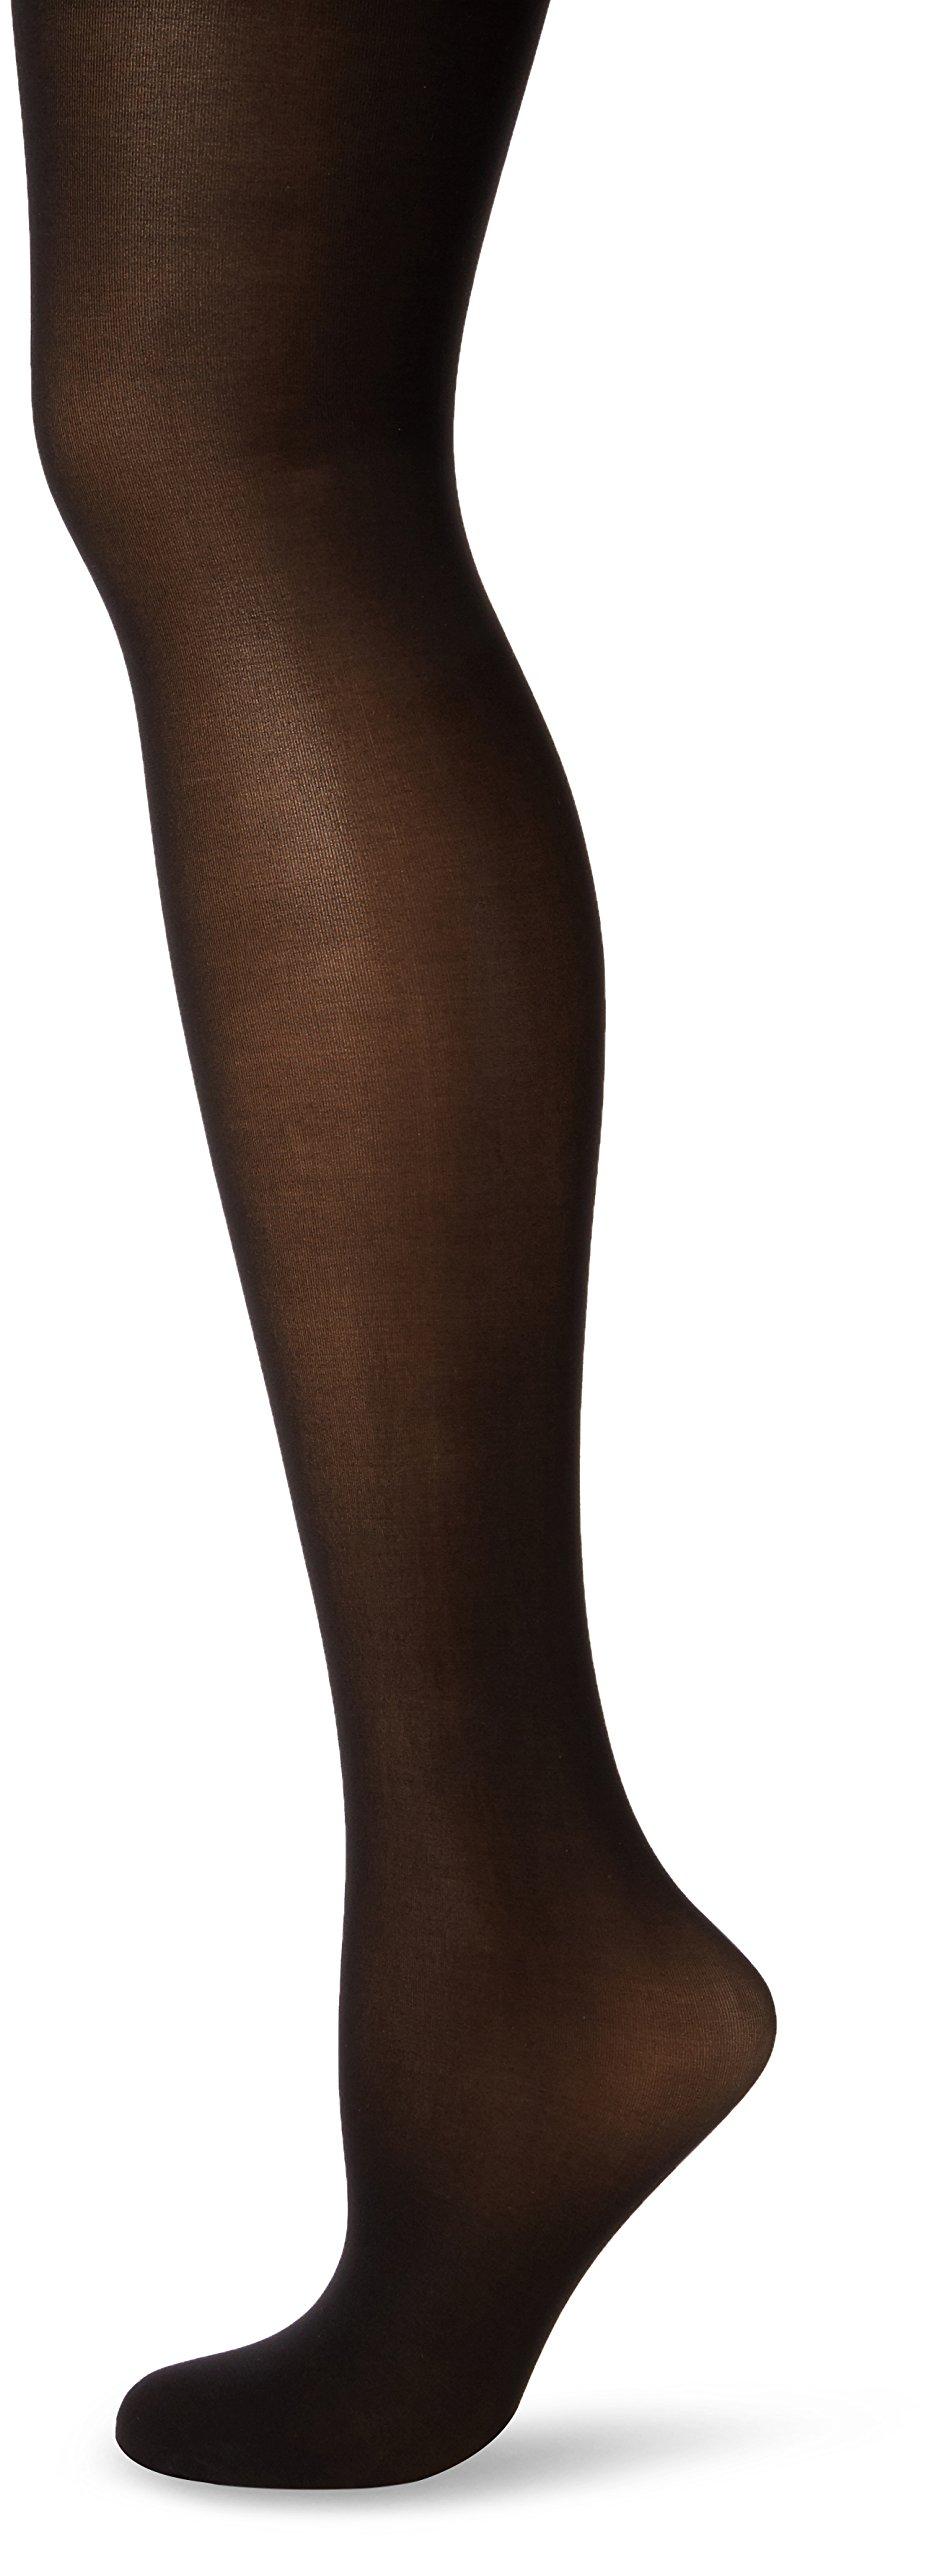 Maidenform Women's Hosiery Sexy Shaping Tummy Flattener, Black, Large